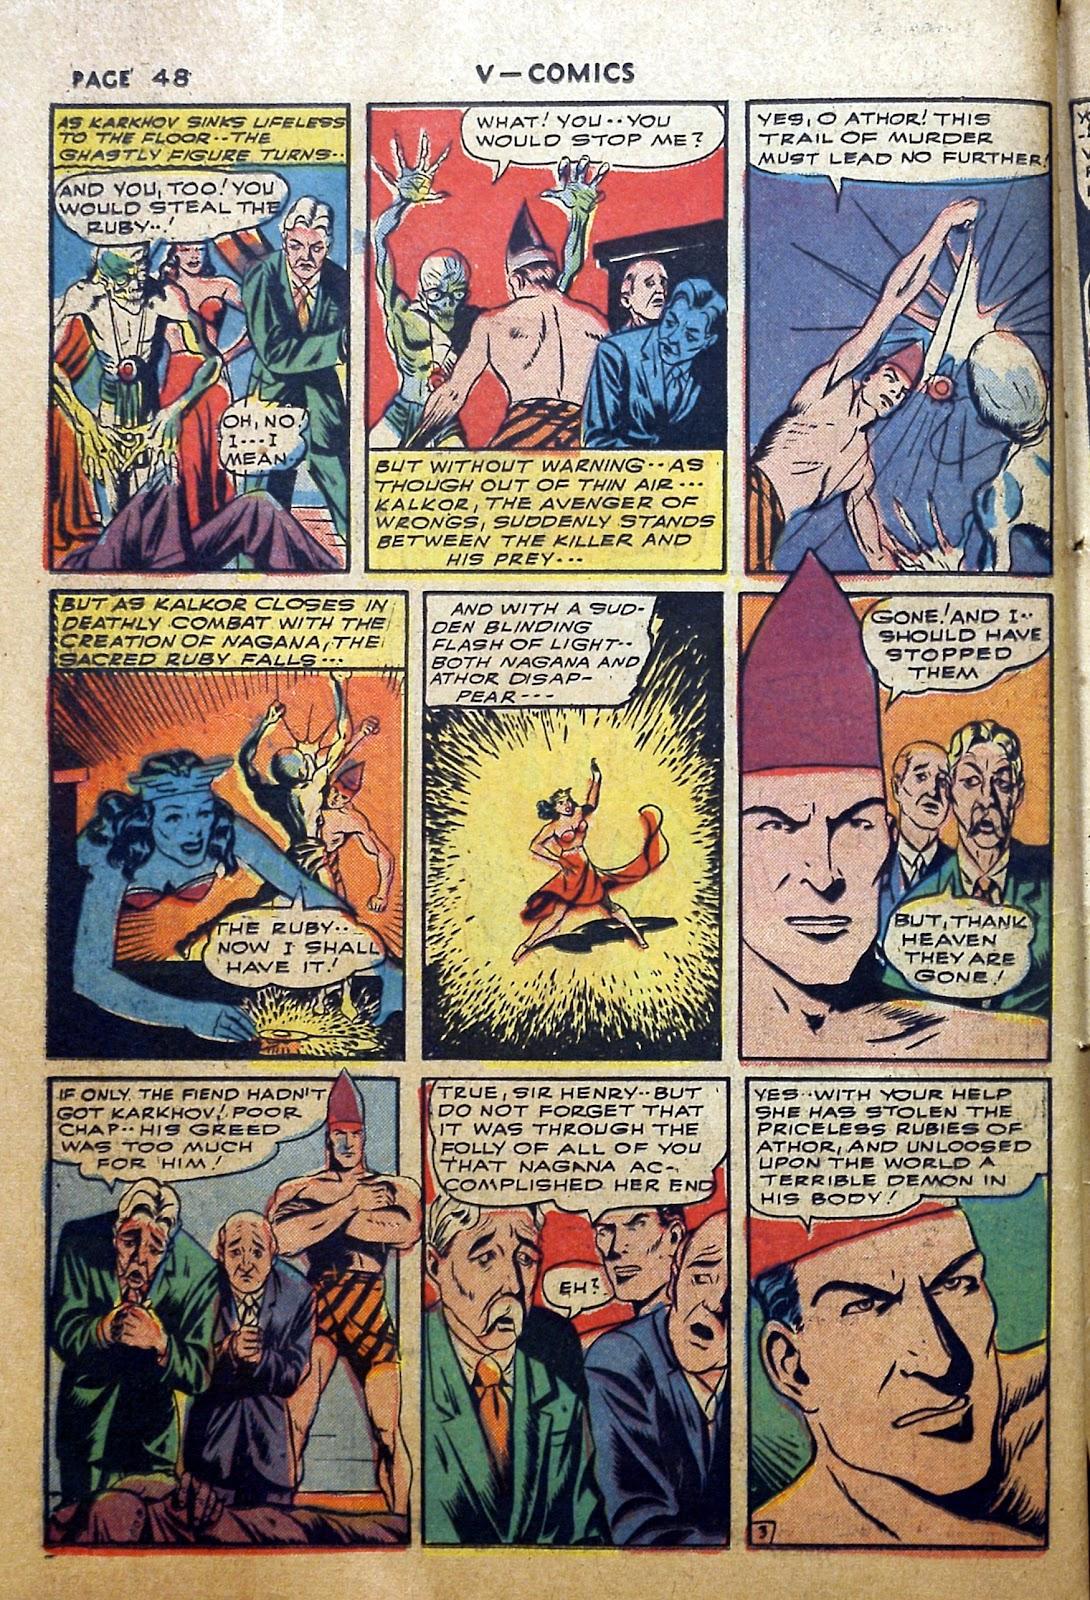 Read online V...- Comics comic -  Issue #2 - 49